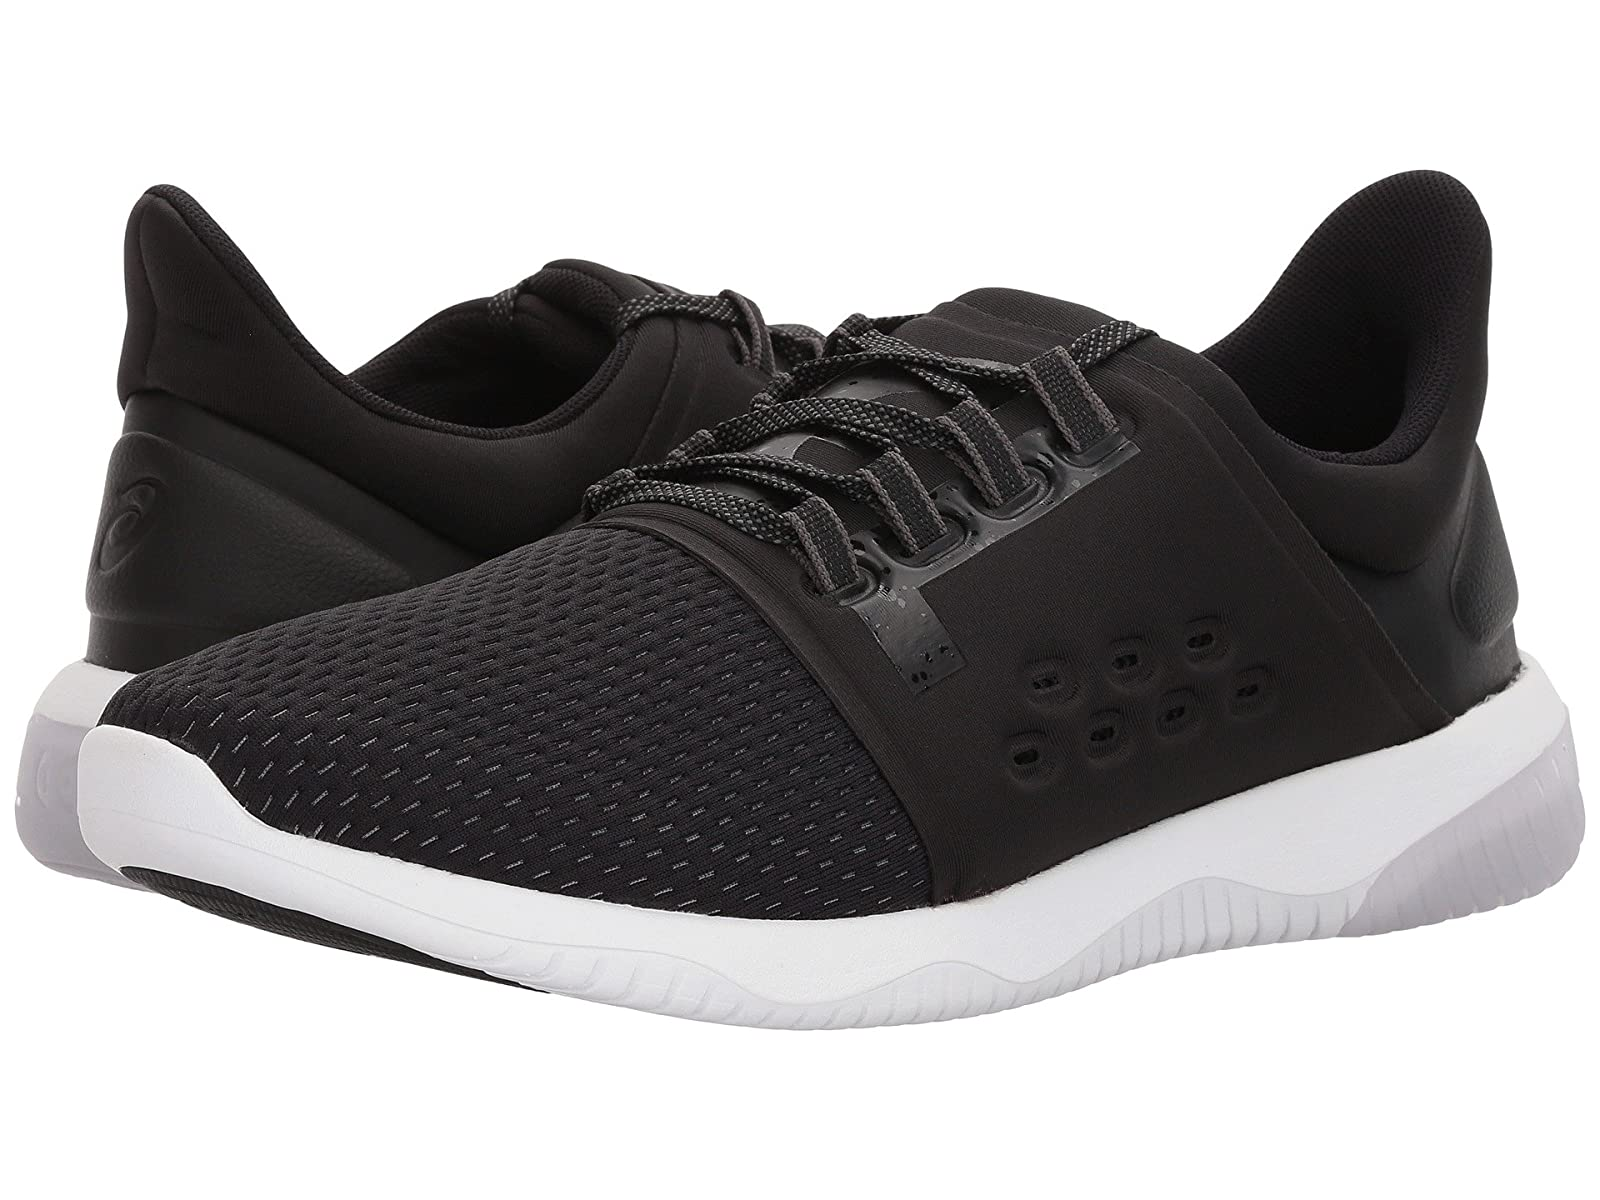 ASICS GEL-Kenun LyteCheap and distinctive eye-catching shoes